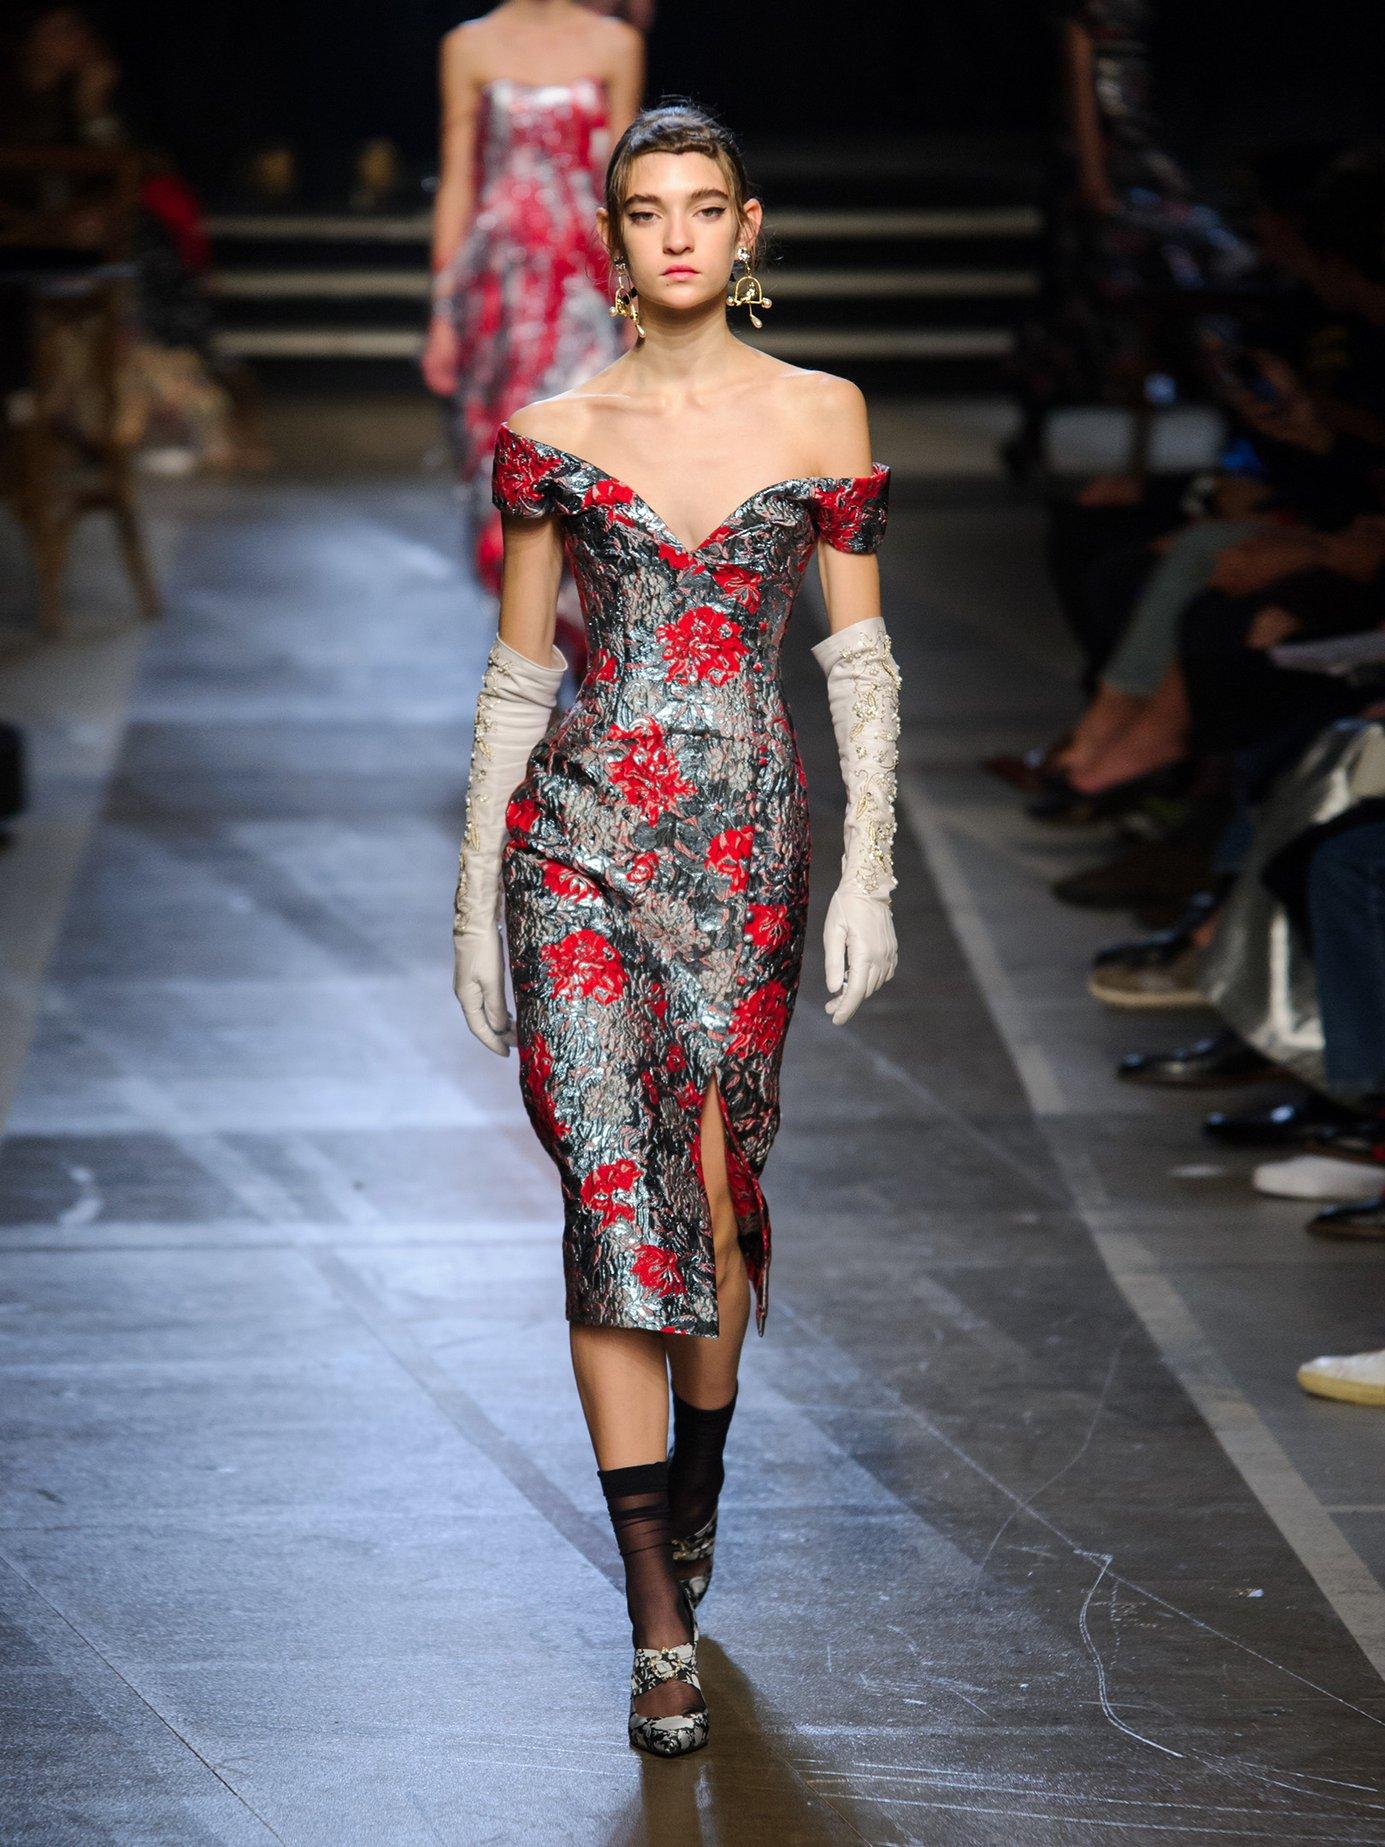 Joyti rose-jacquard dress by Erdem